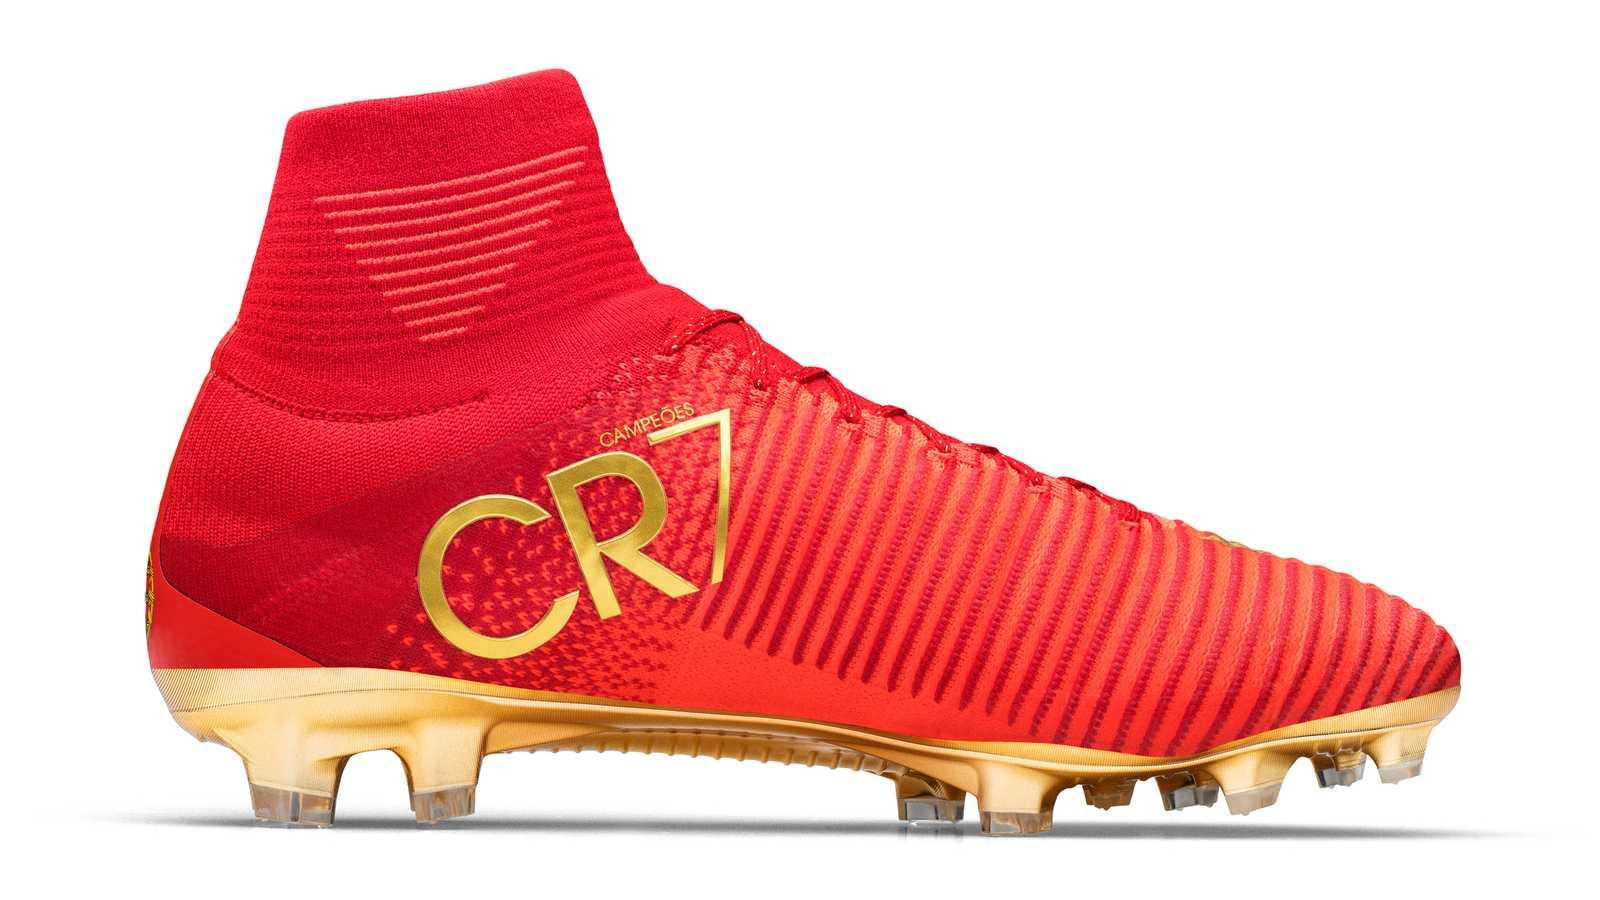 Discover Cristiano Ronaldo's Nike Limited Edition Boots Limited Edition Discover Cristiano Ronaldo's Nike Limited Edition Boots nike mercurial superfly v cristiano ronaldo campeoes boots 4